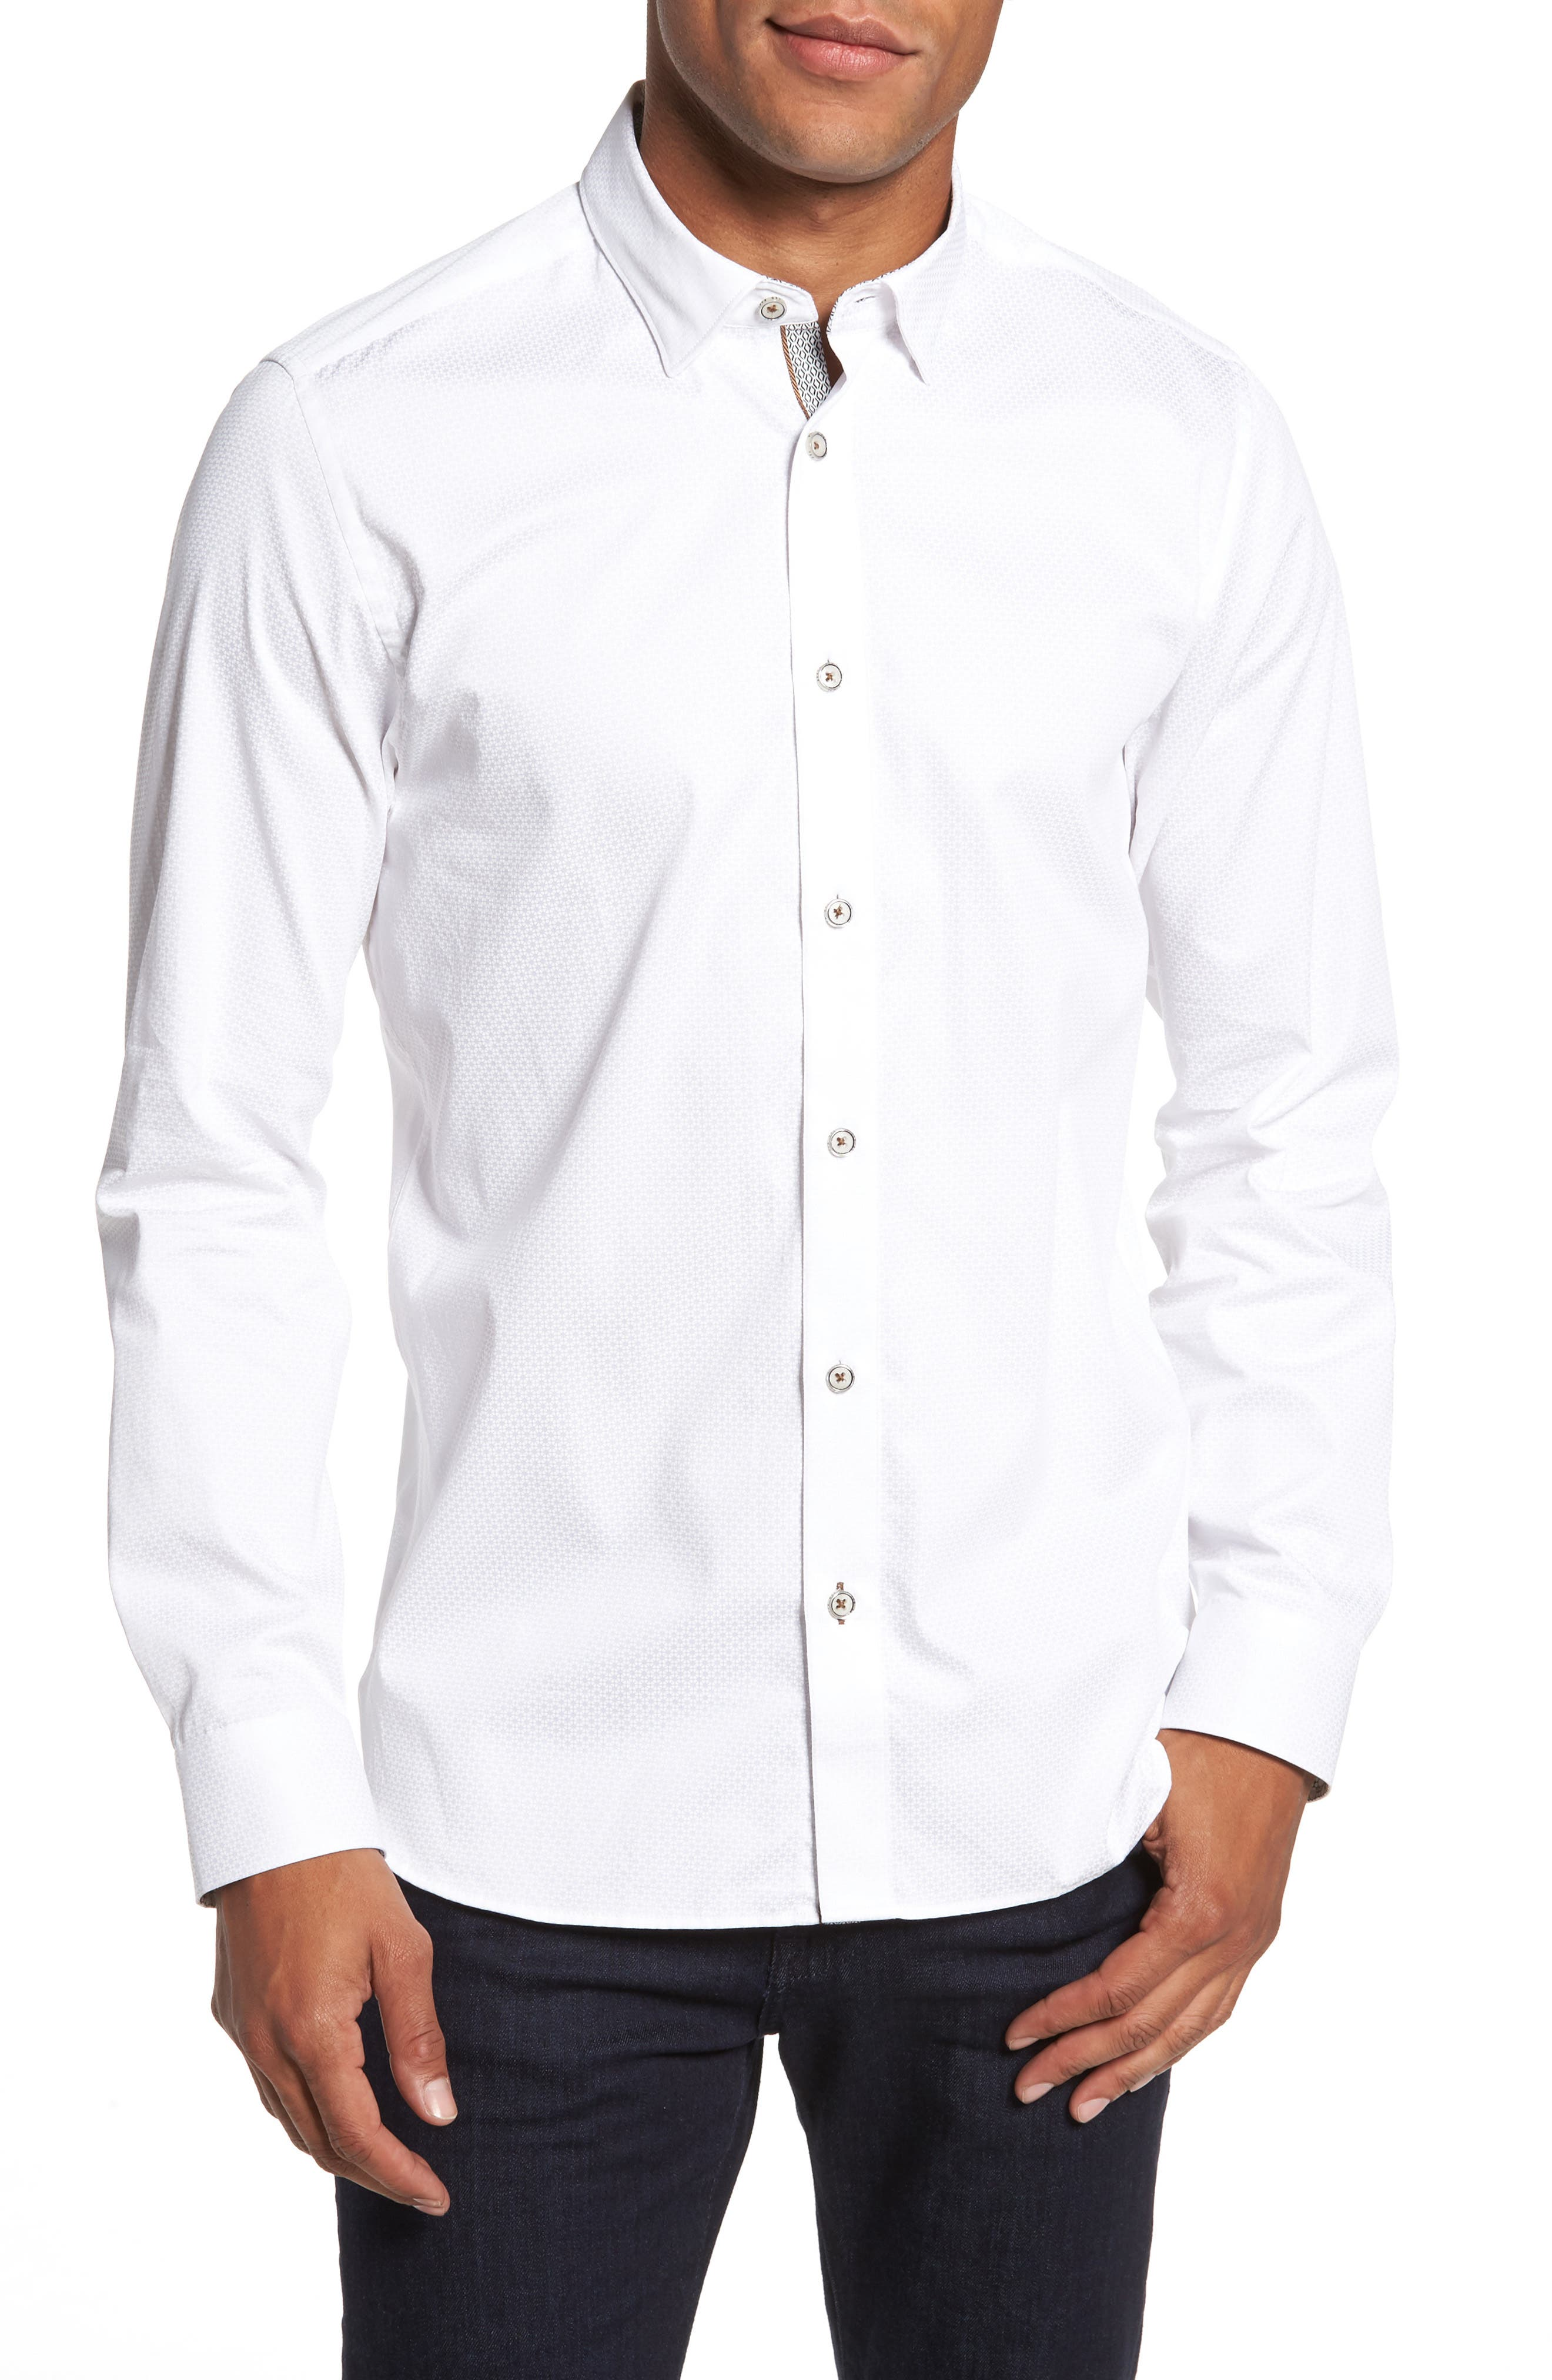 Strazbo Tonal Print Sport Shirt,                             Main thumbnail 1, color,                             White